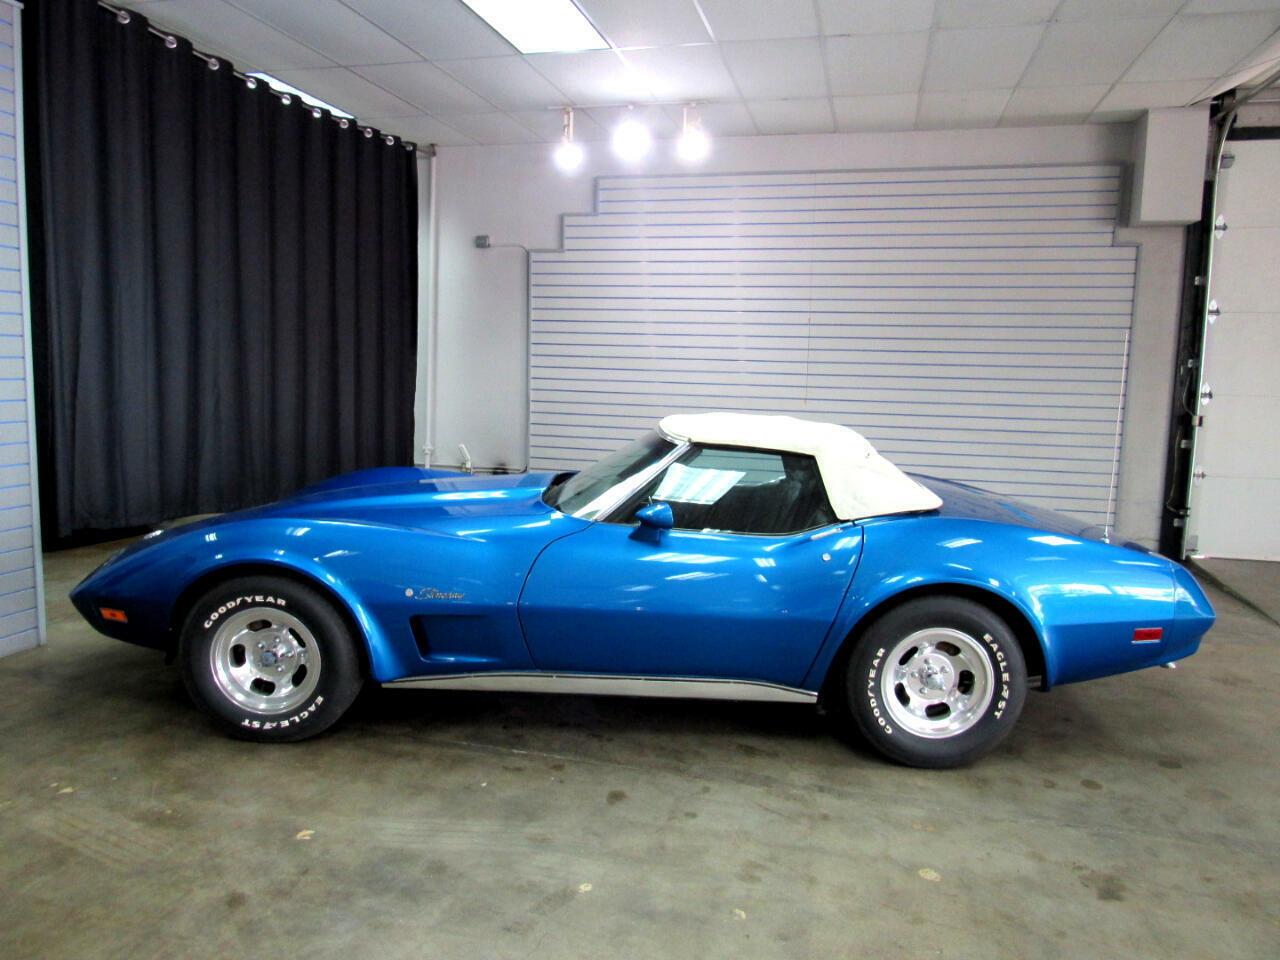 1974 Blue Chevrolet Corvette Convertible  | C3 Corvette Photo 3